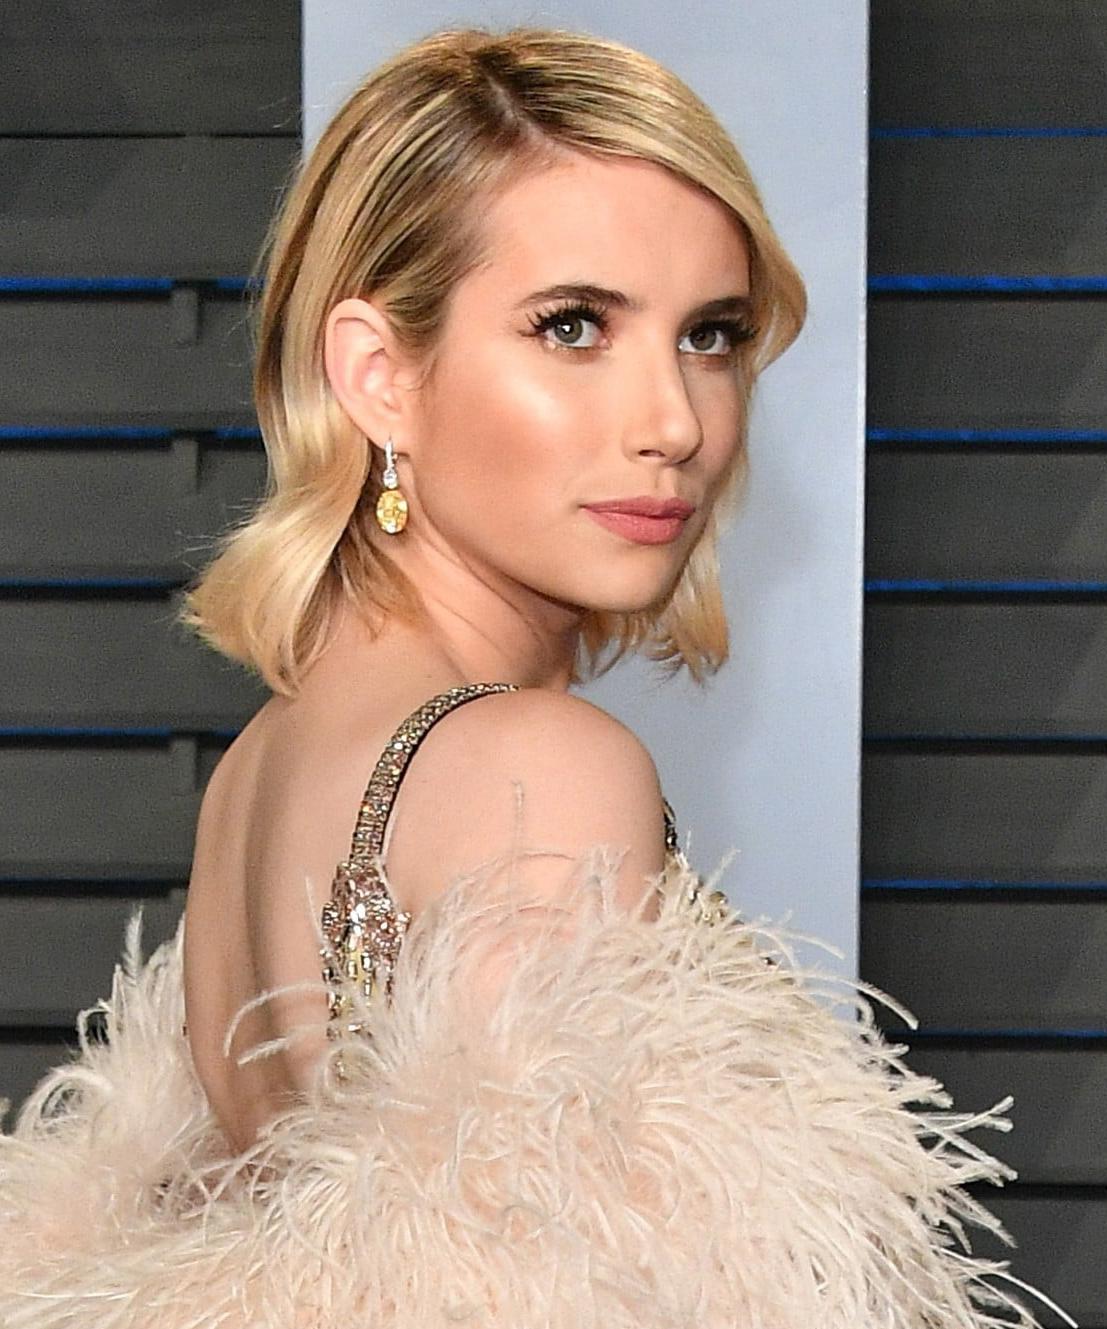 Emma-Roberts-Prada-Dress-Oscars-Afterparty-2018